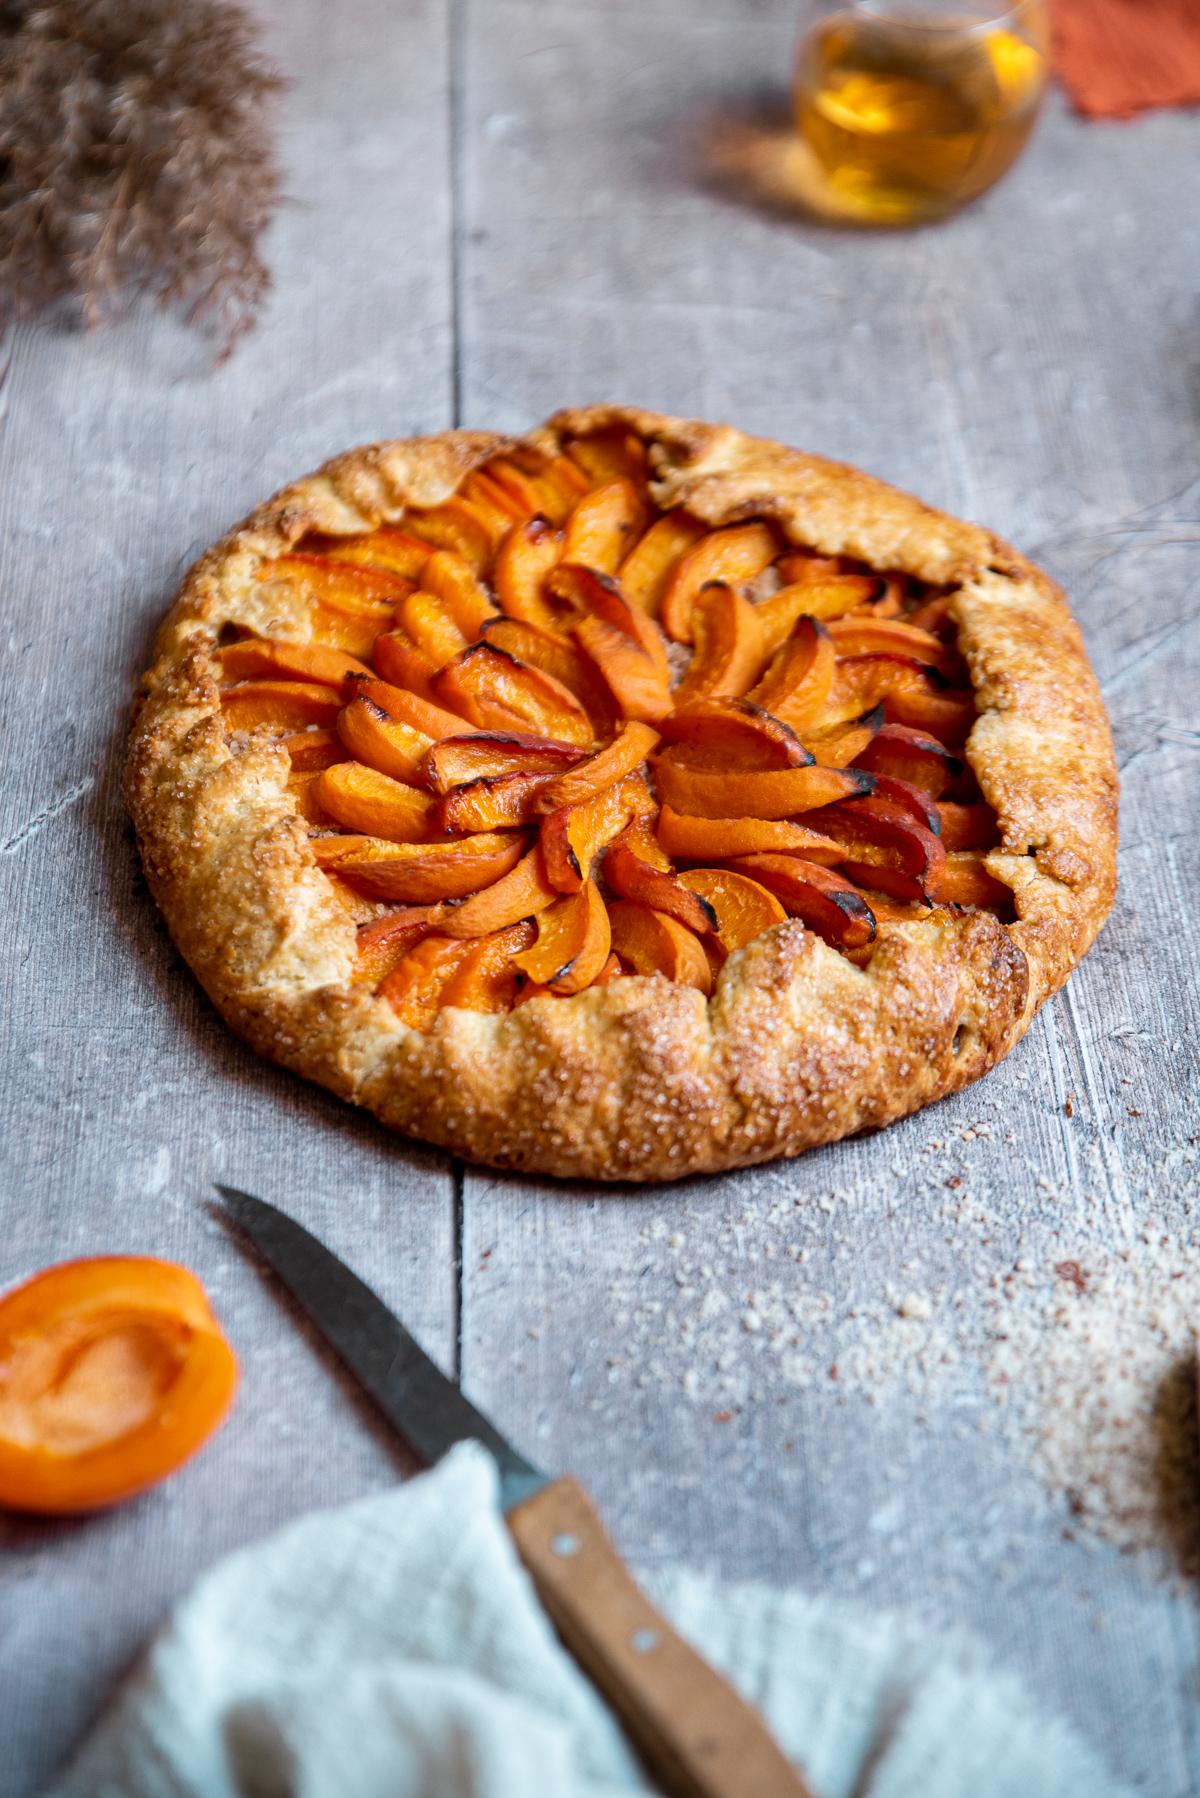 recette tarte abricot amande facile dessert gourmand de saison